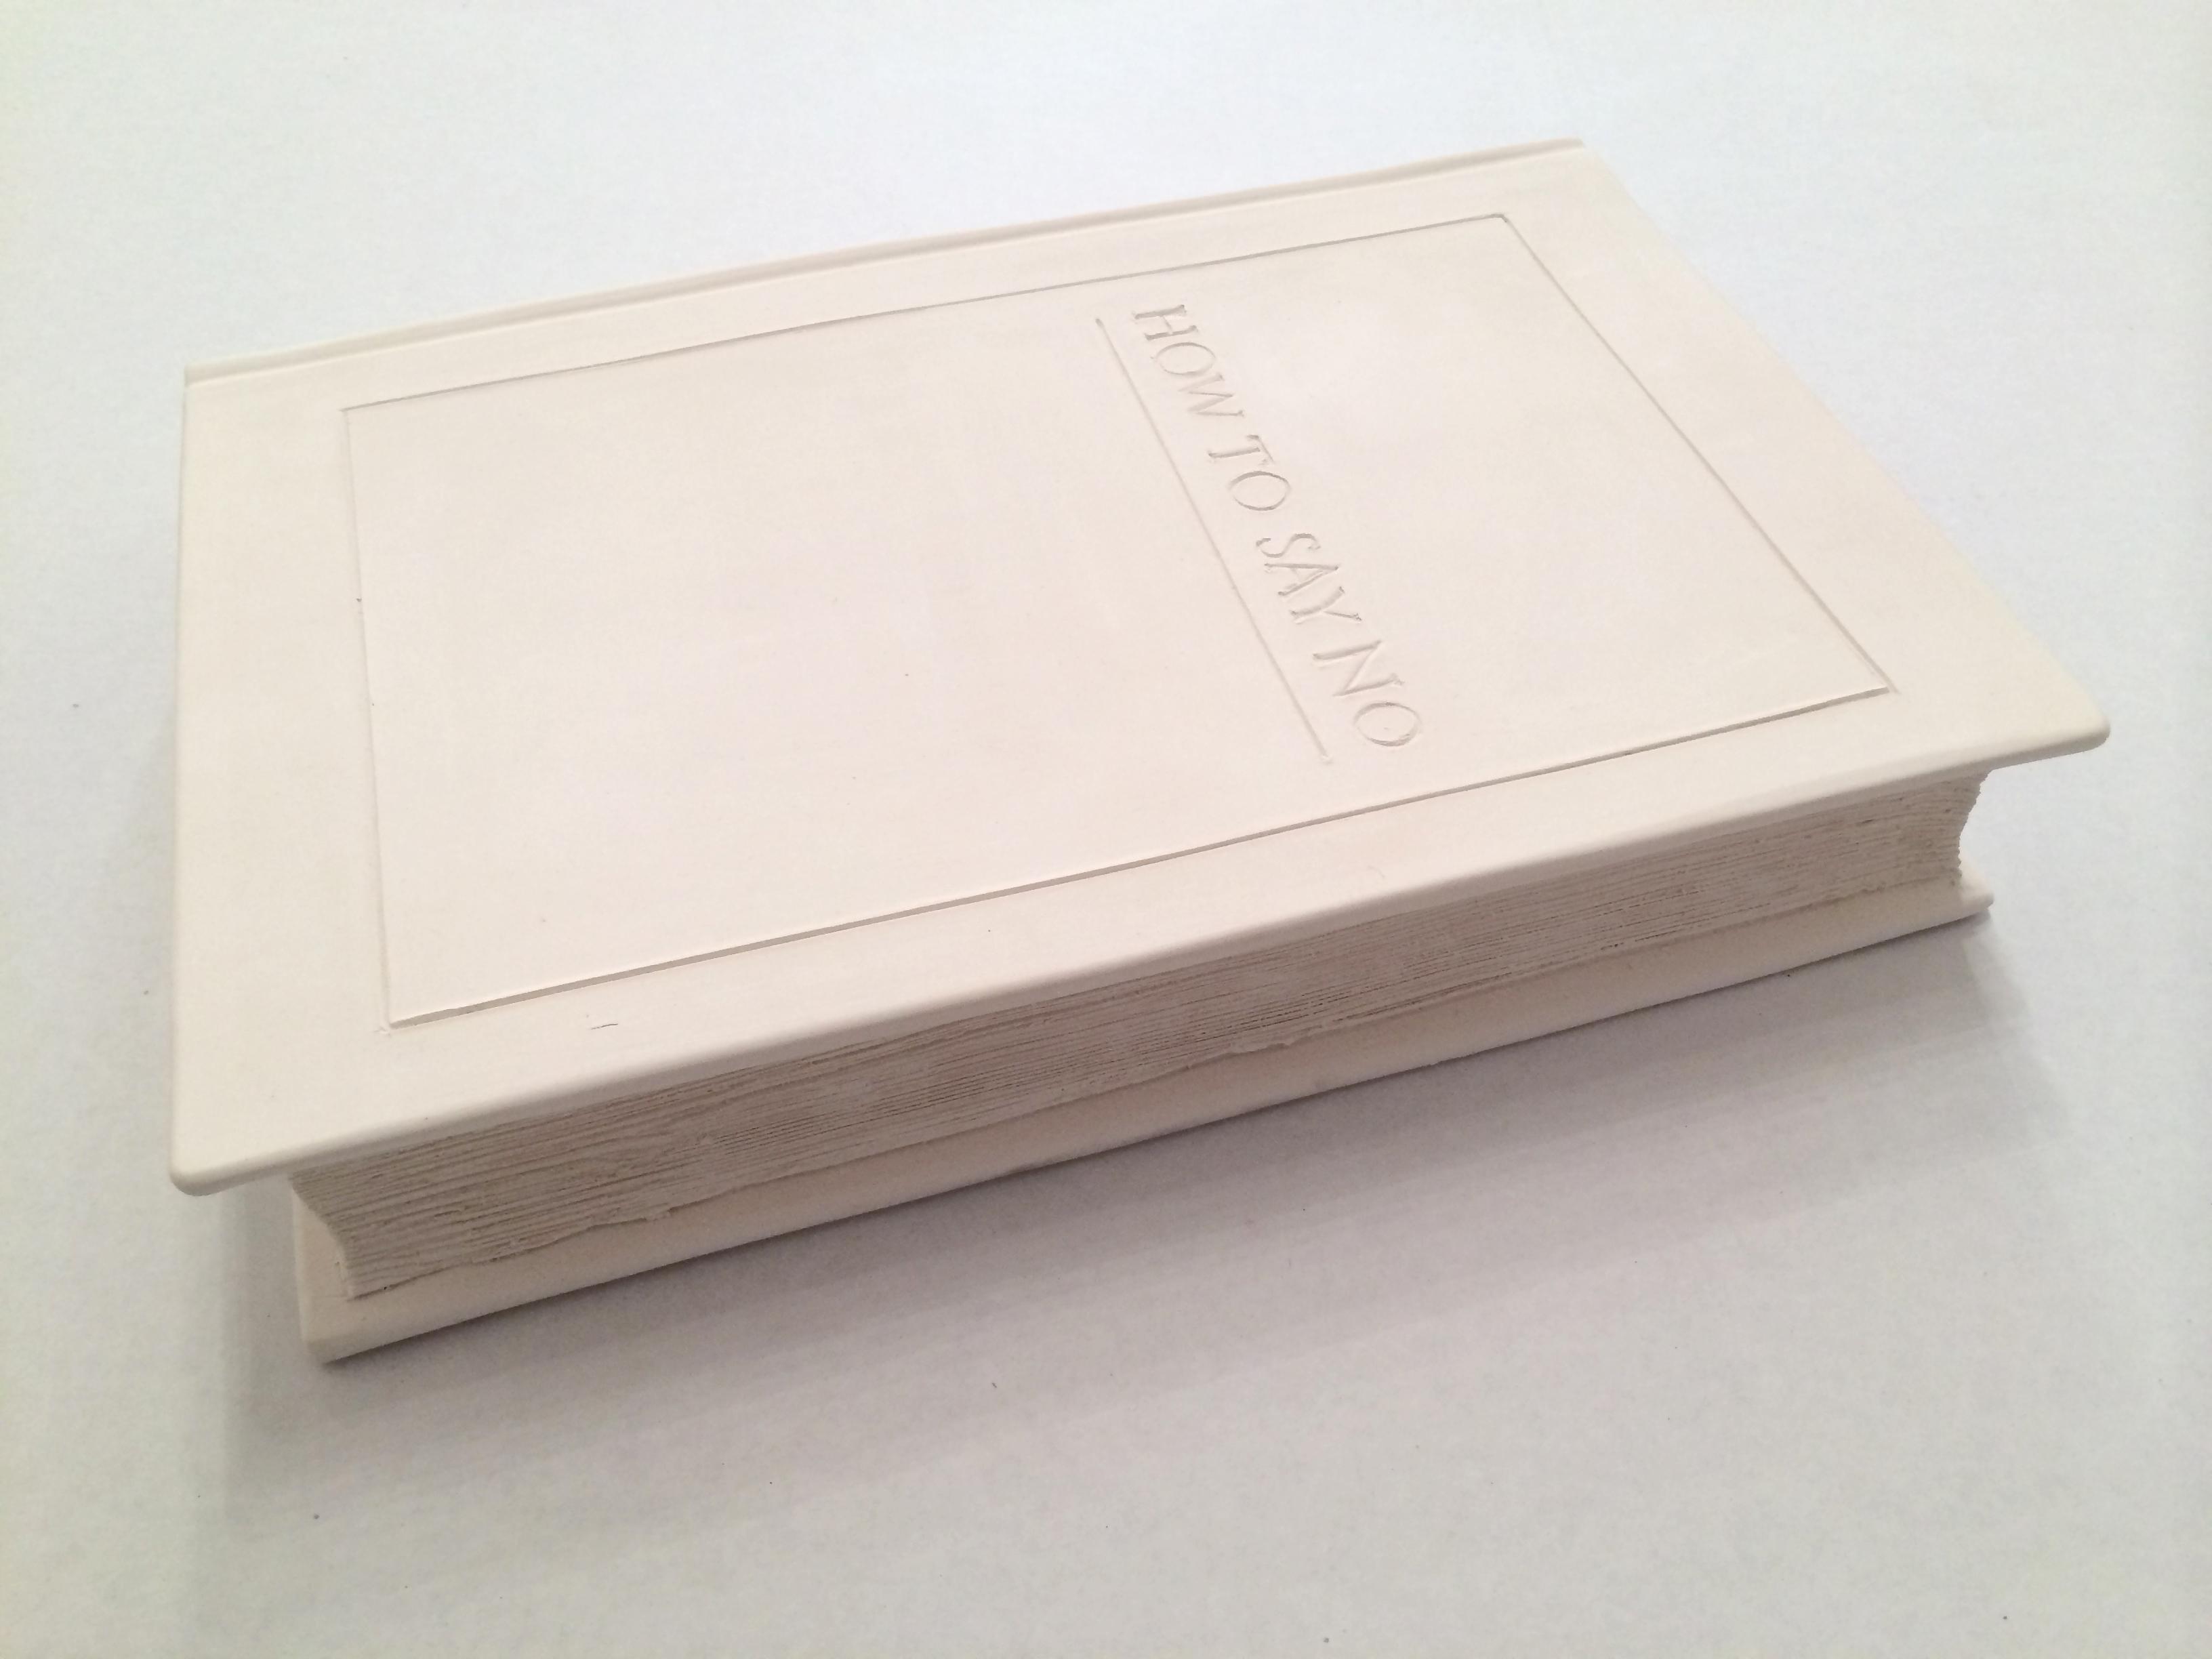 Carlotta Kohl, How to Say No, 2015. Ceramic. 11 x 16 x 3 inches